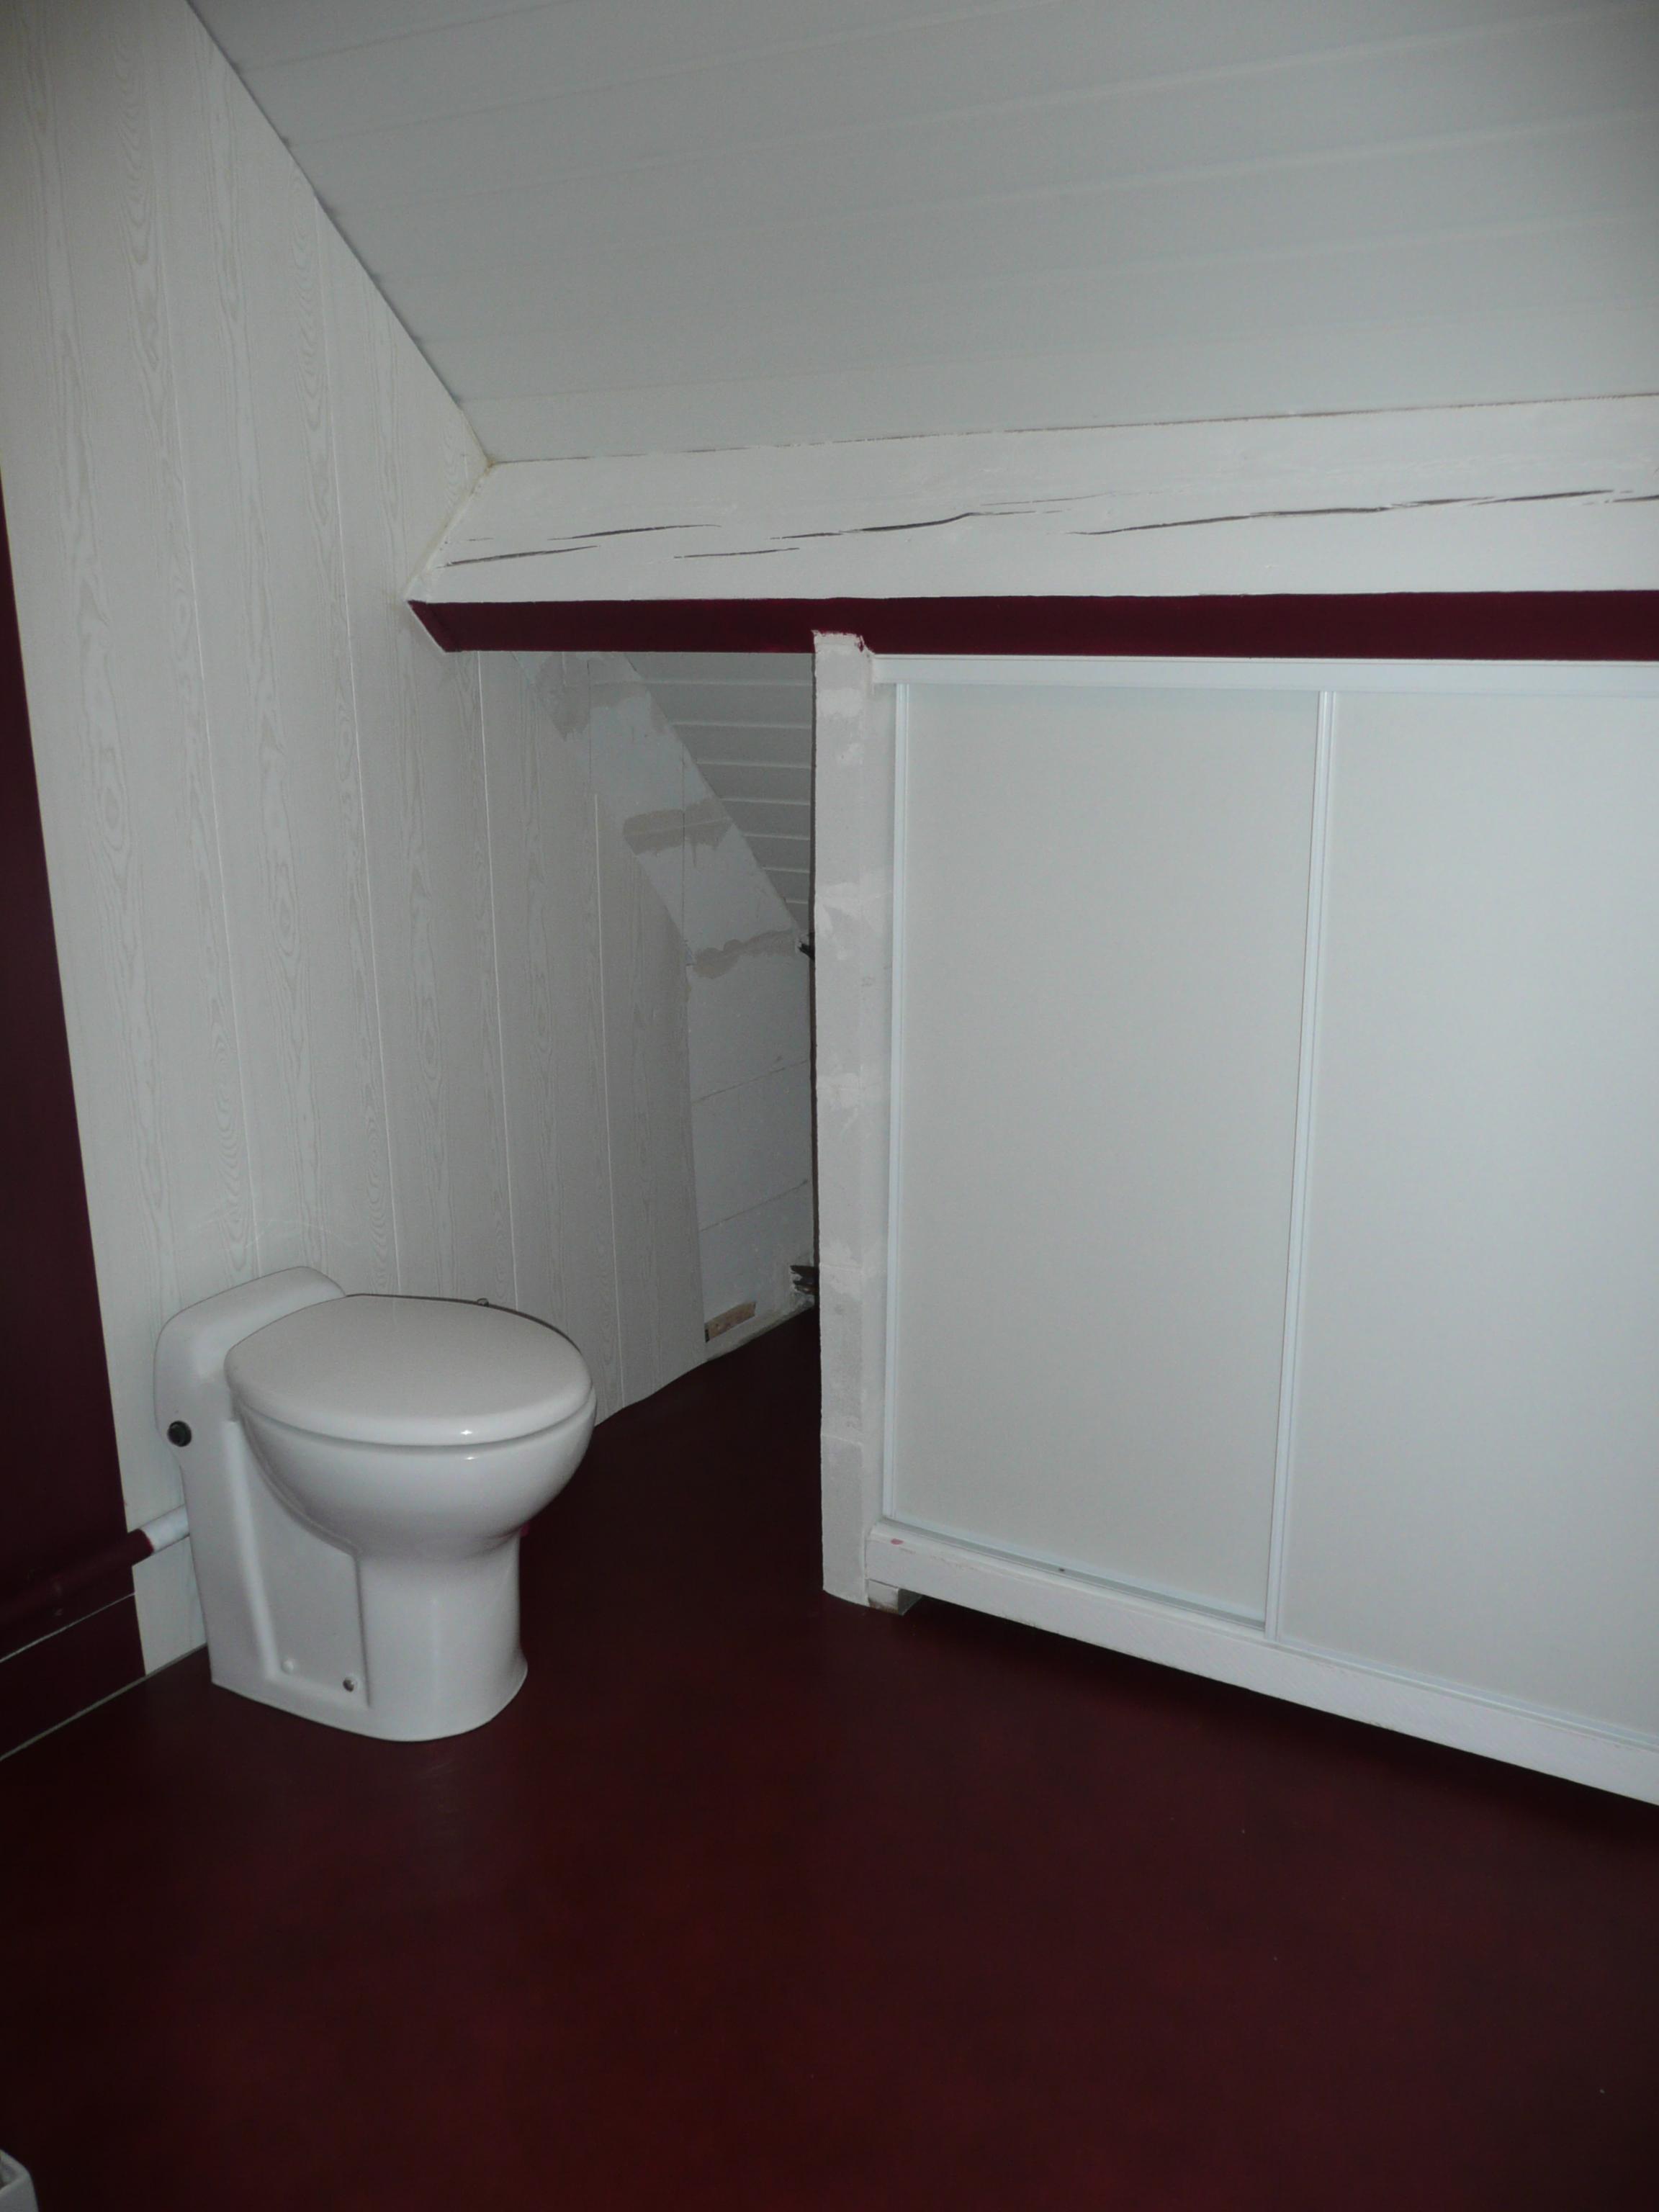 Habillage des murs de la salle de bain r nov malong re58 - Habillage mur salle de bain ...